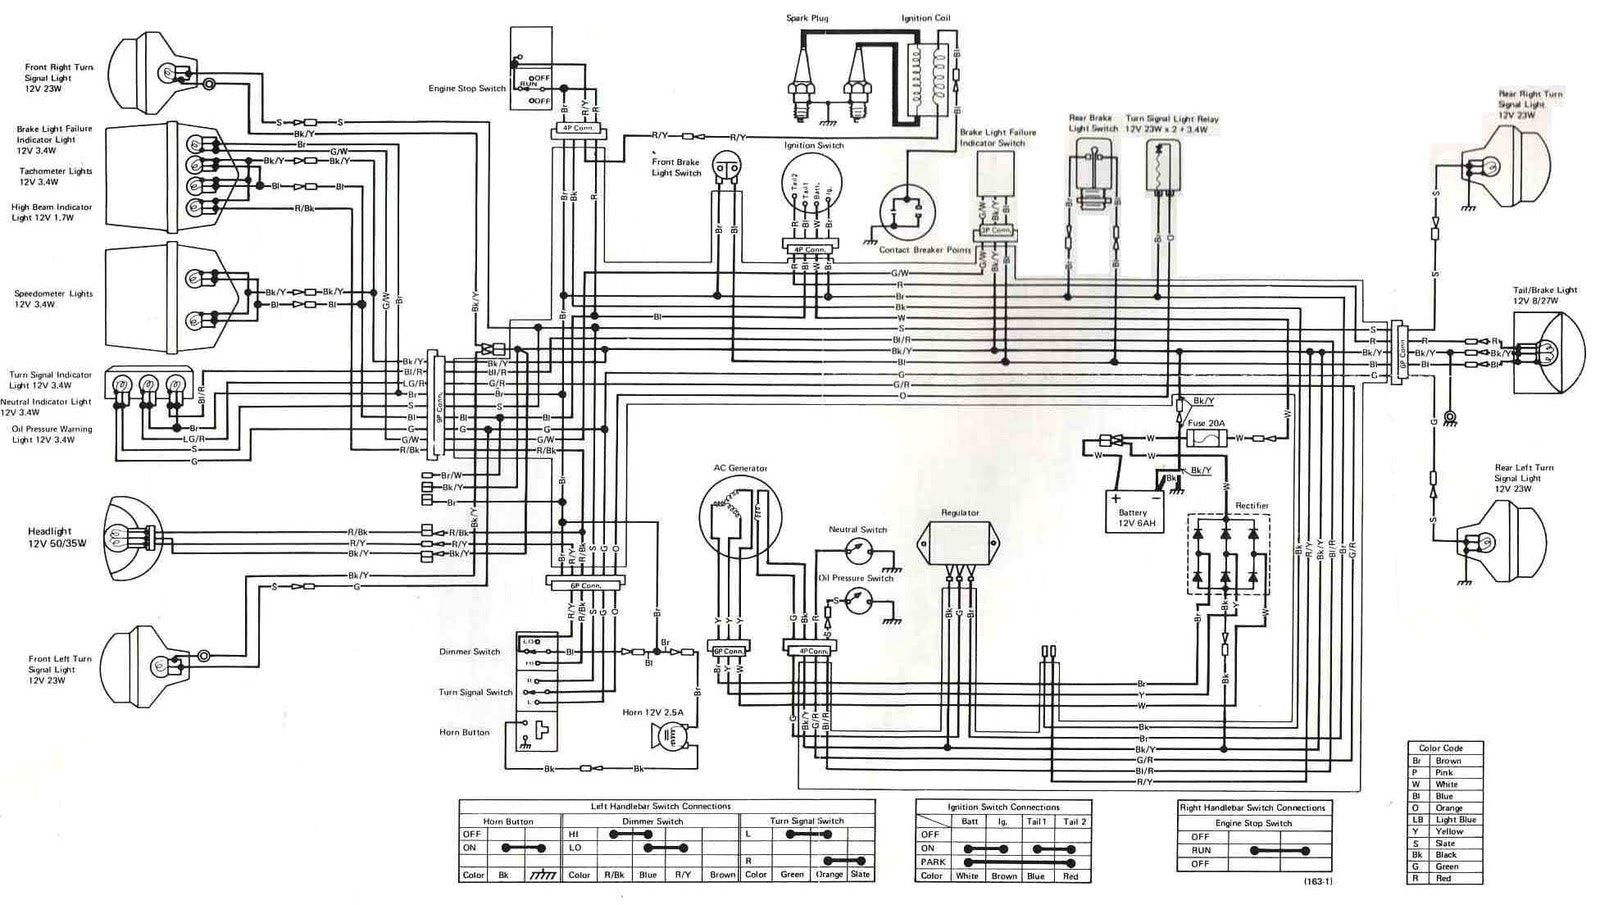 2008 yamaha r6 ignition wiring diagram